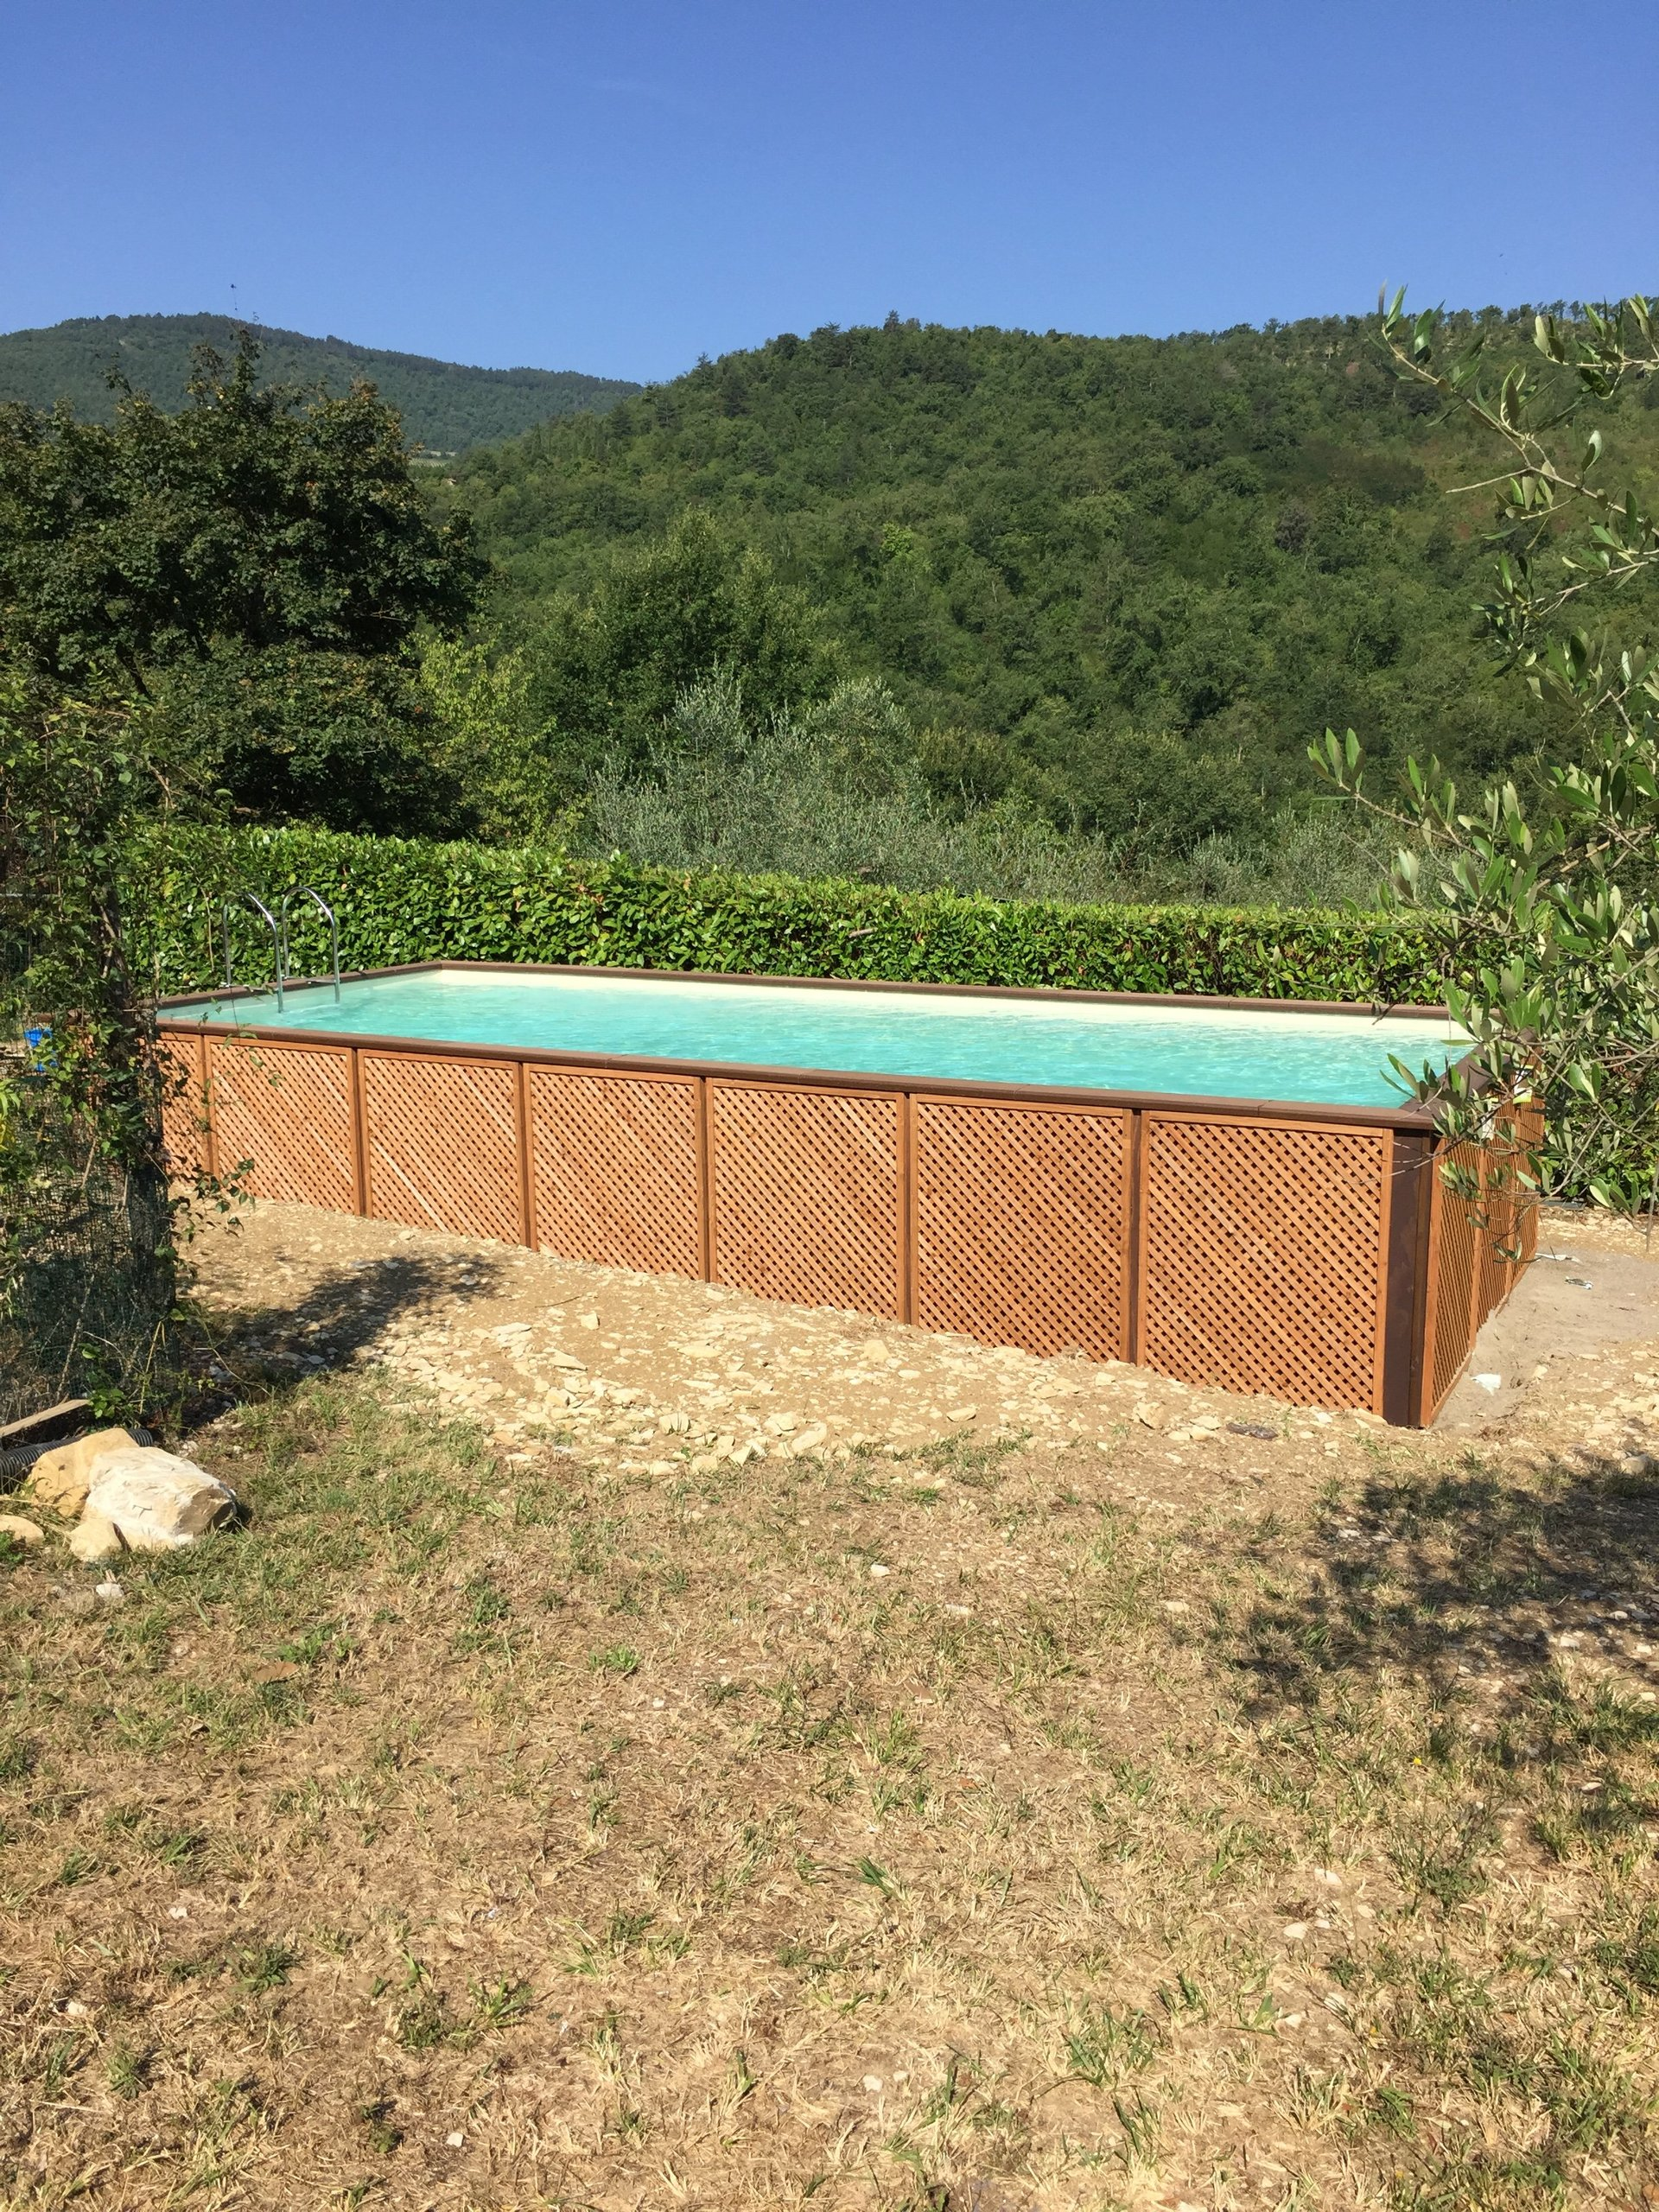 Dolcevita laghetto firenze aqva service piscine - Piscine laghetto dolce vita prix ...